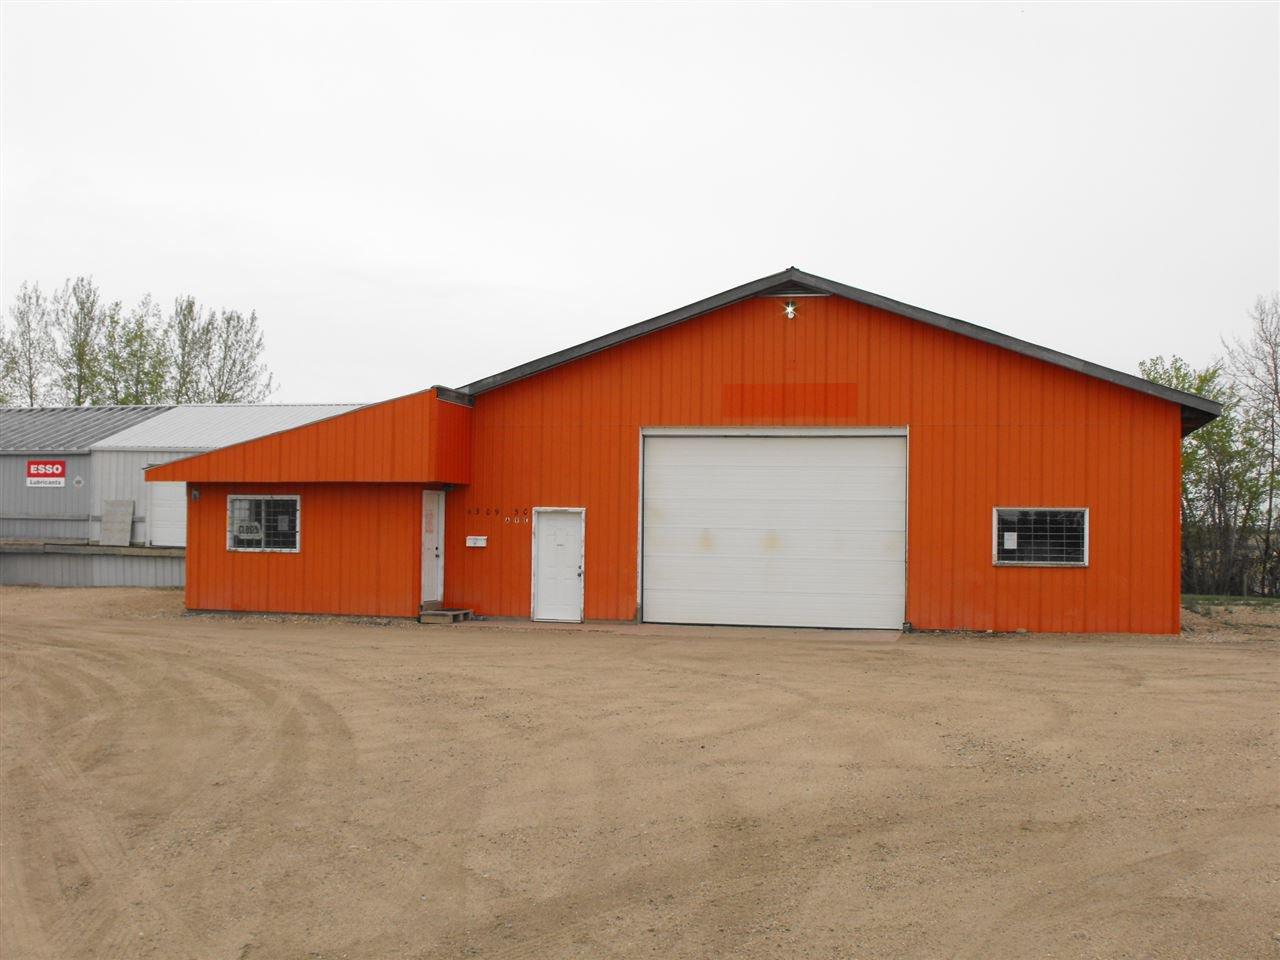 Main Photo: 4301 4309 50 Avenue: Elk Point Industrial for sale : MLS®# E4198446